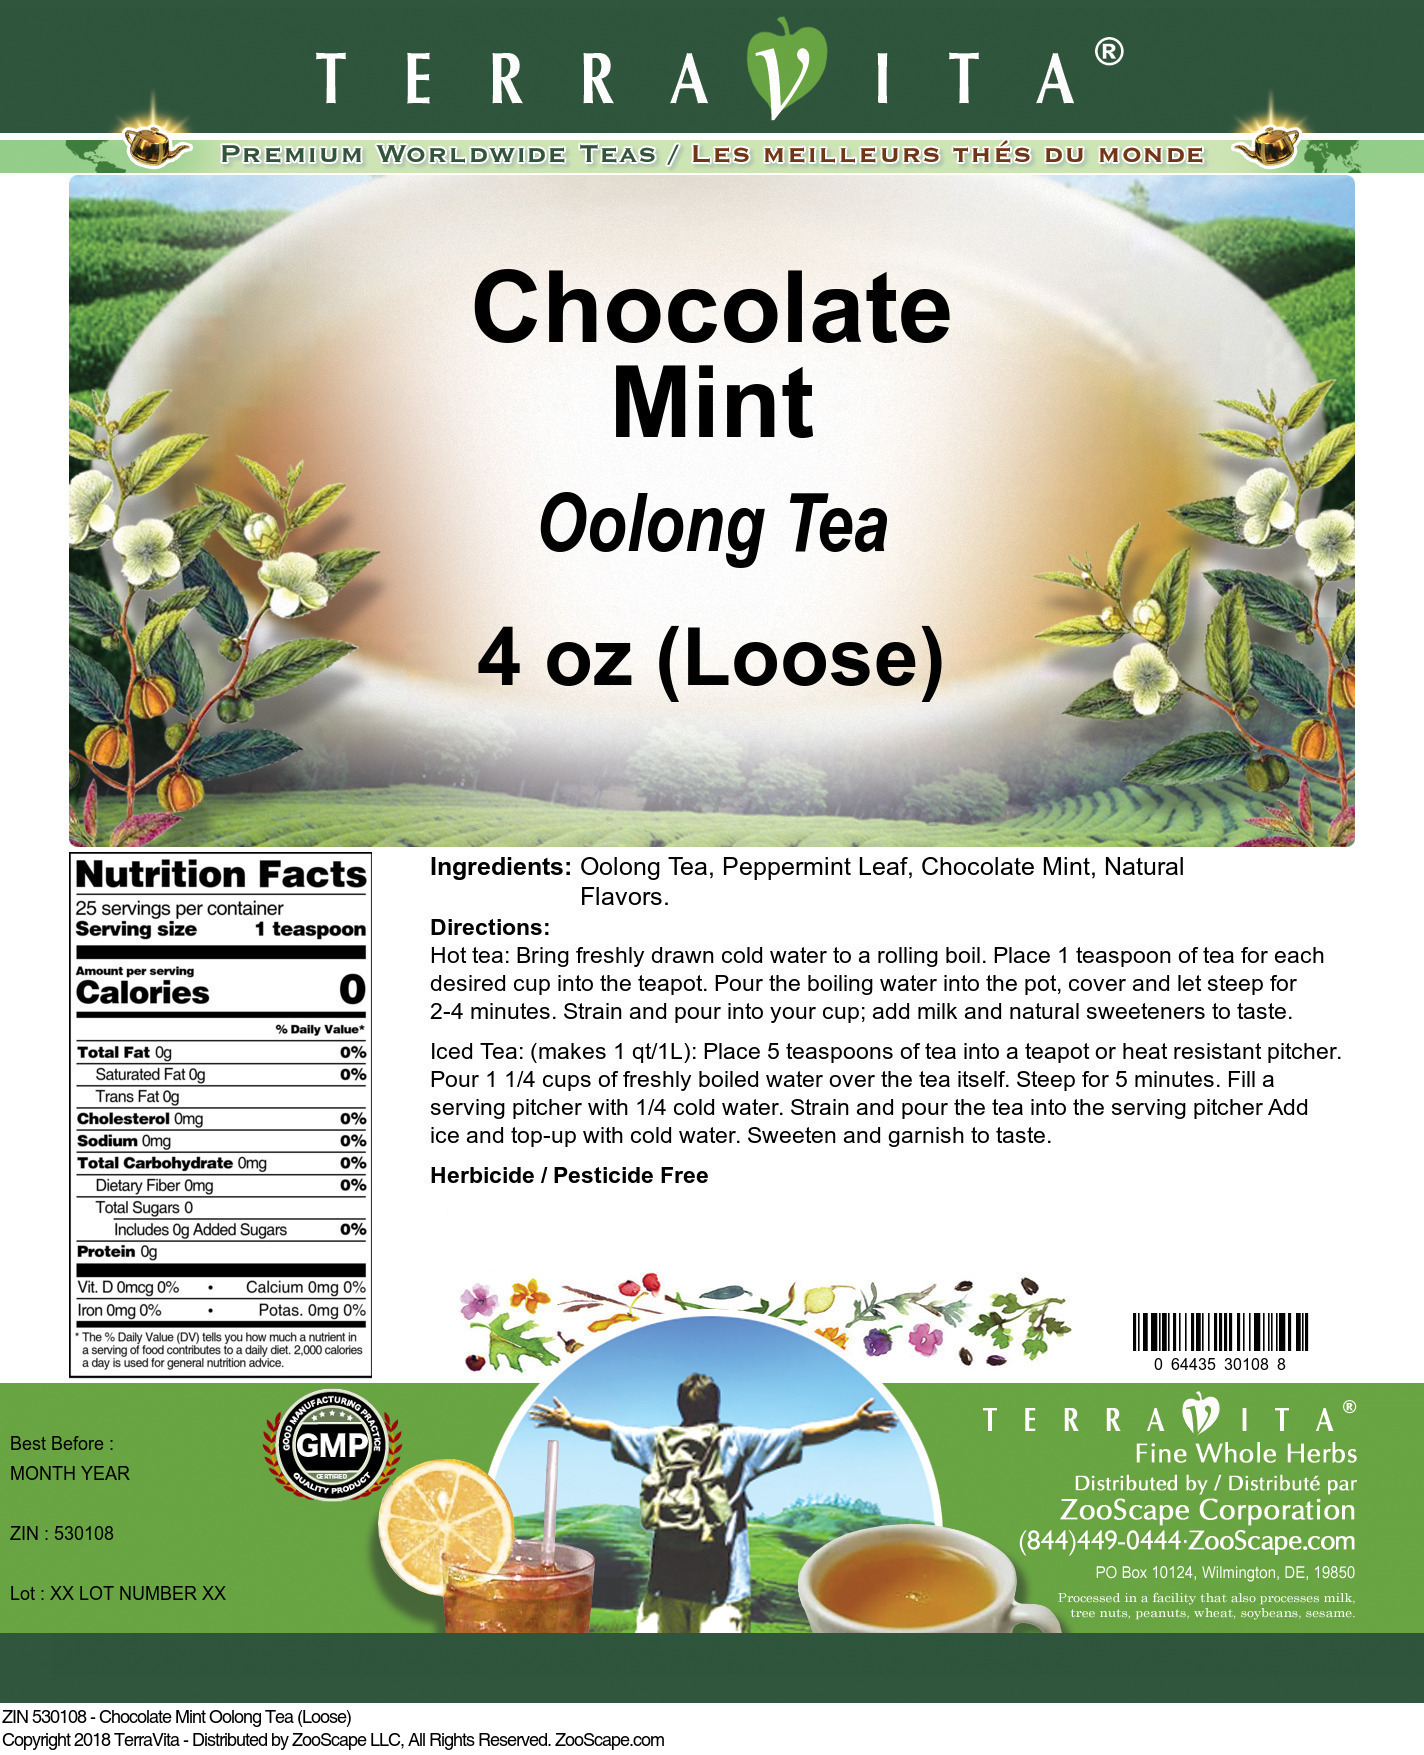 Chocolate Mint Oolong Tea (Loose)